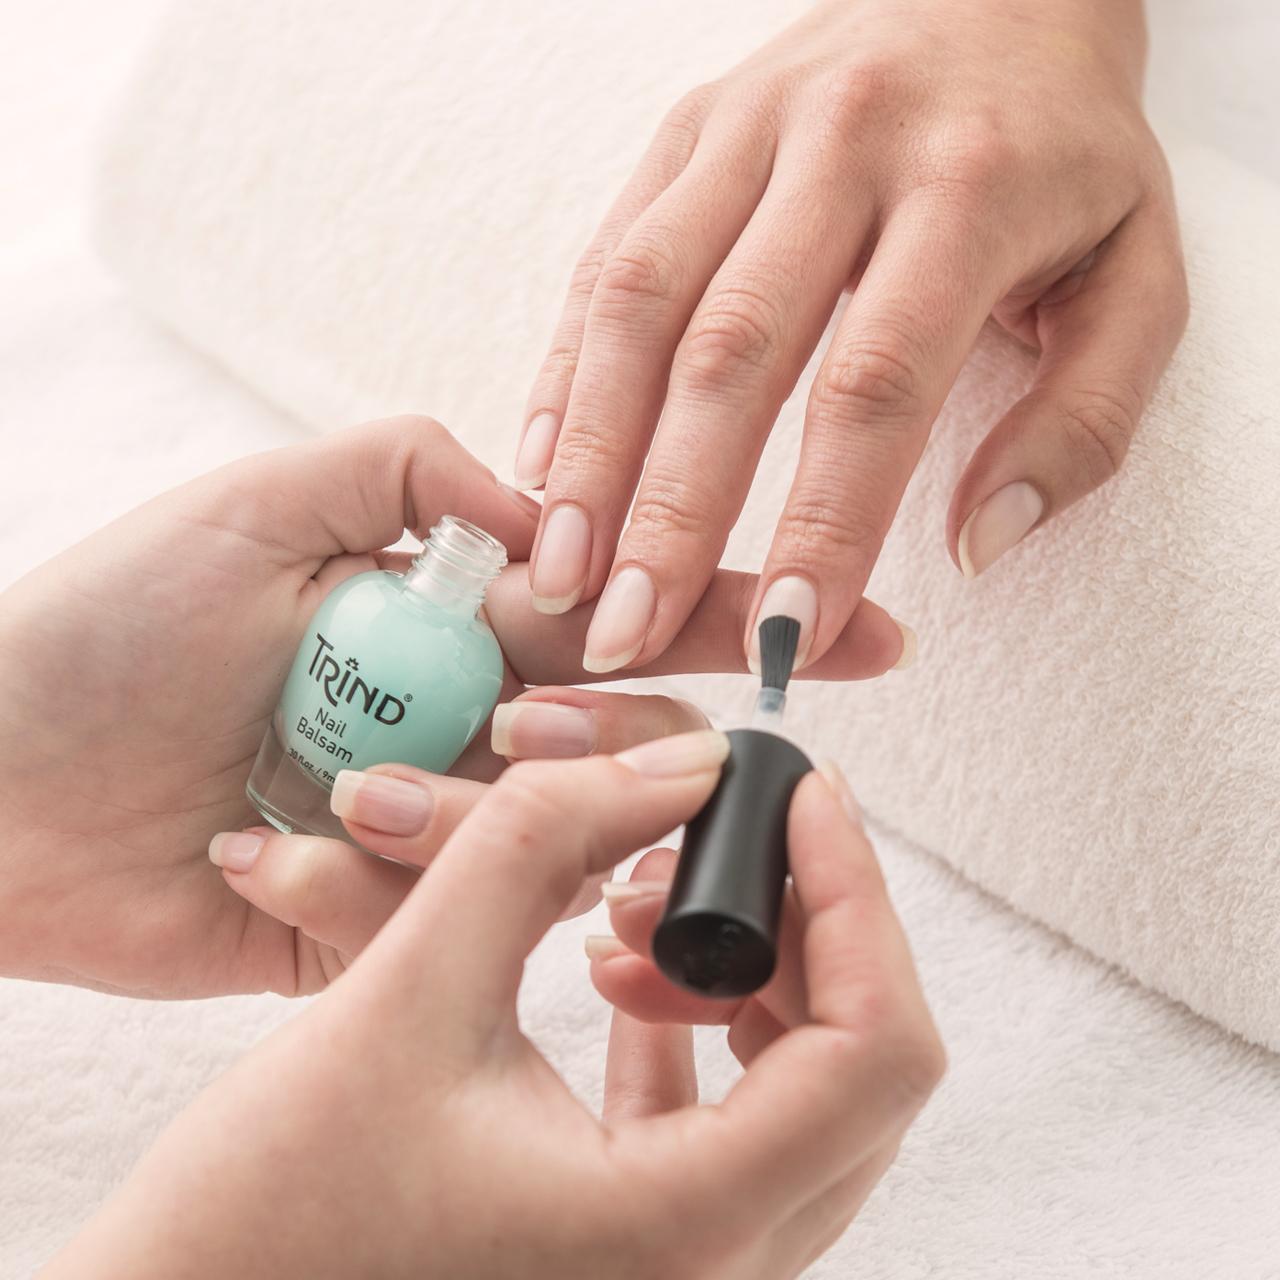 Beautiful nails - Trind Cosmetics